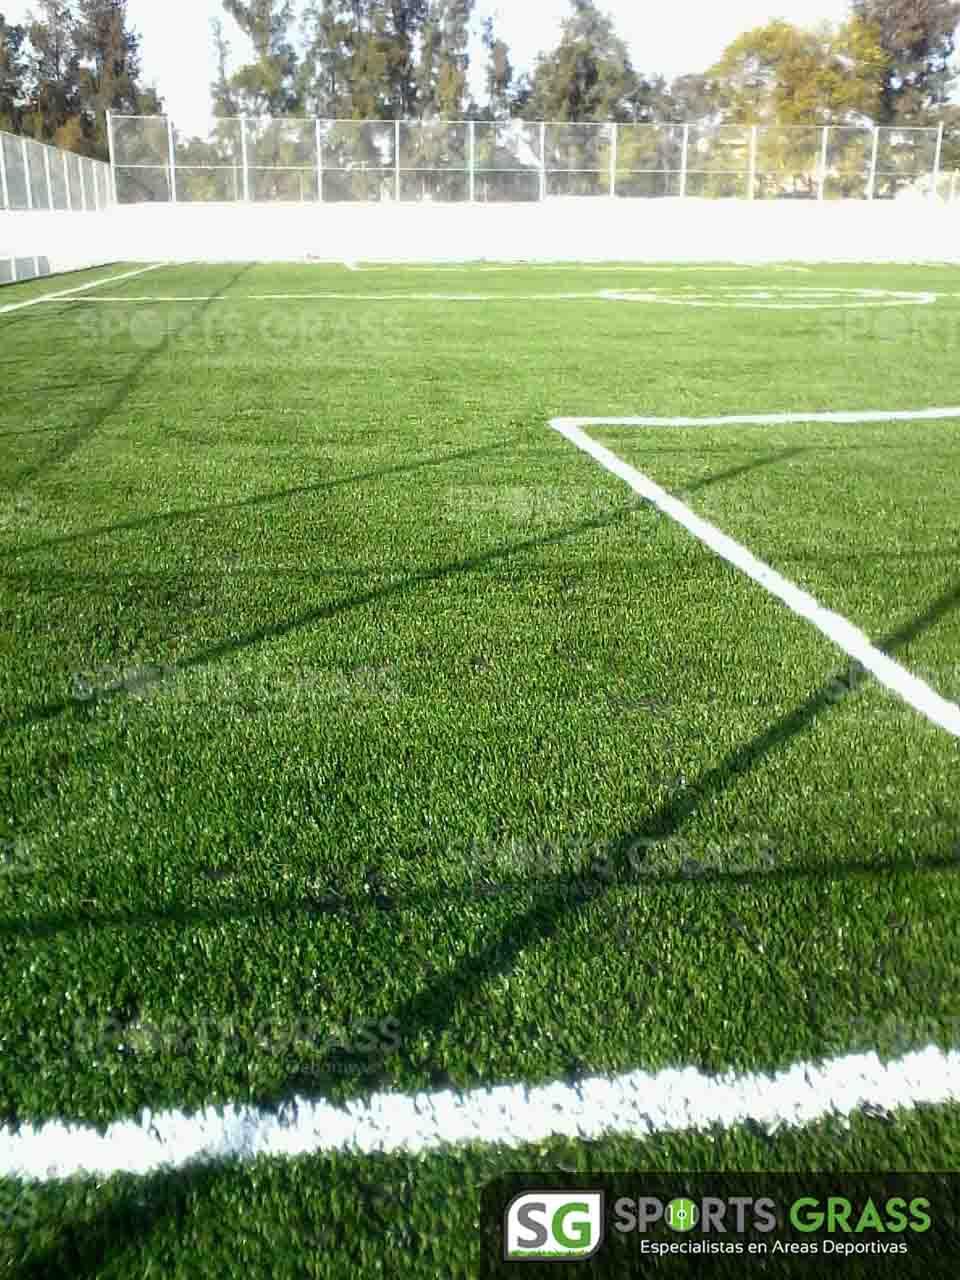 Cancha Futbol 7 Apaseo el Alto Guanajuato Sports Grass 03